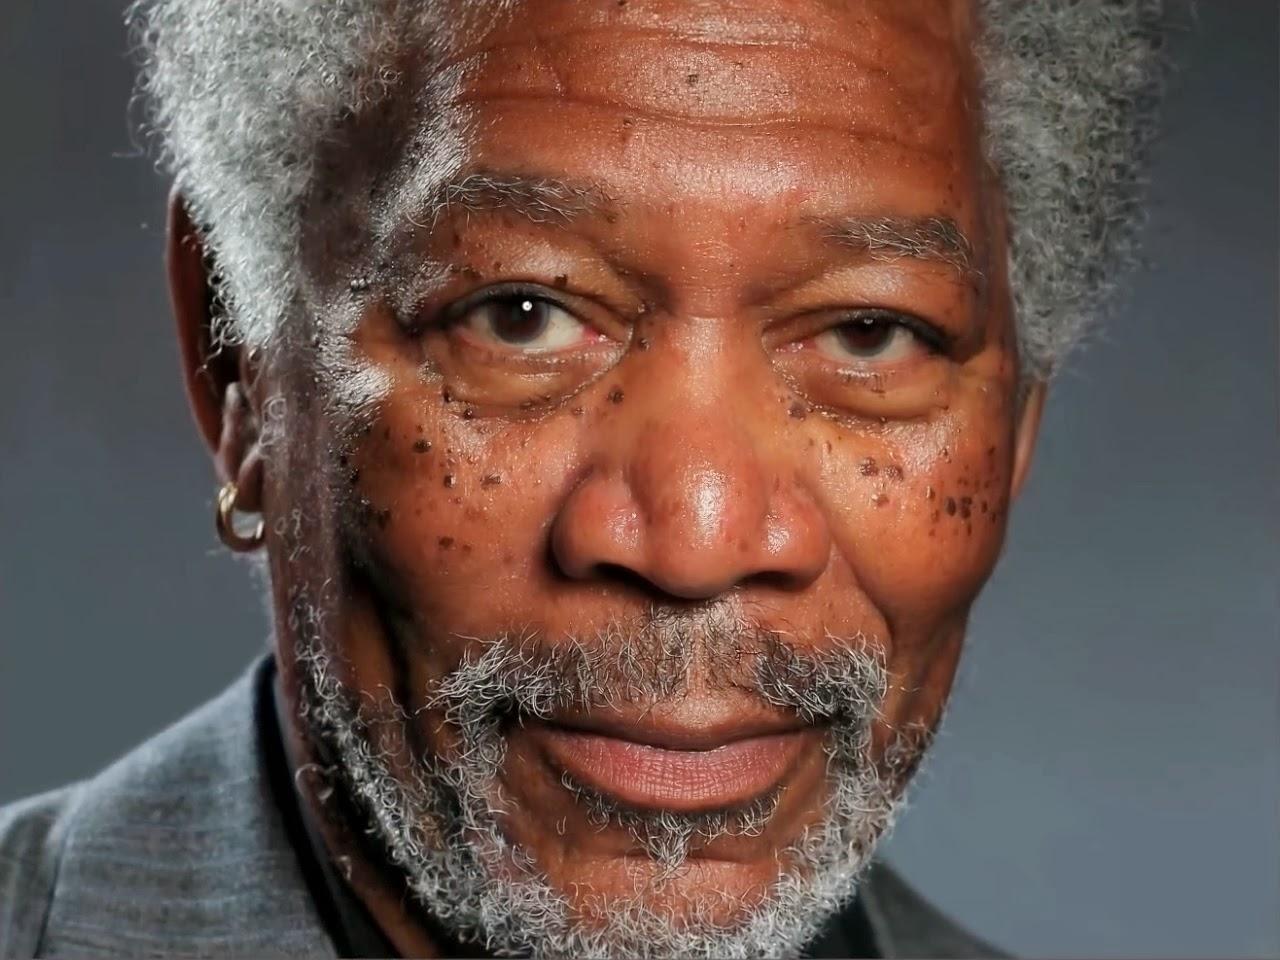 Kyle Lambert pinturas hiperrealismo Morgan Freeman